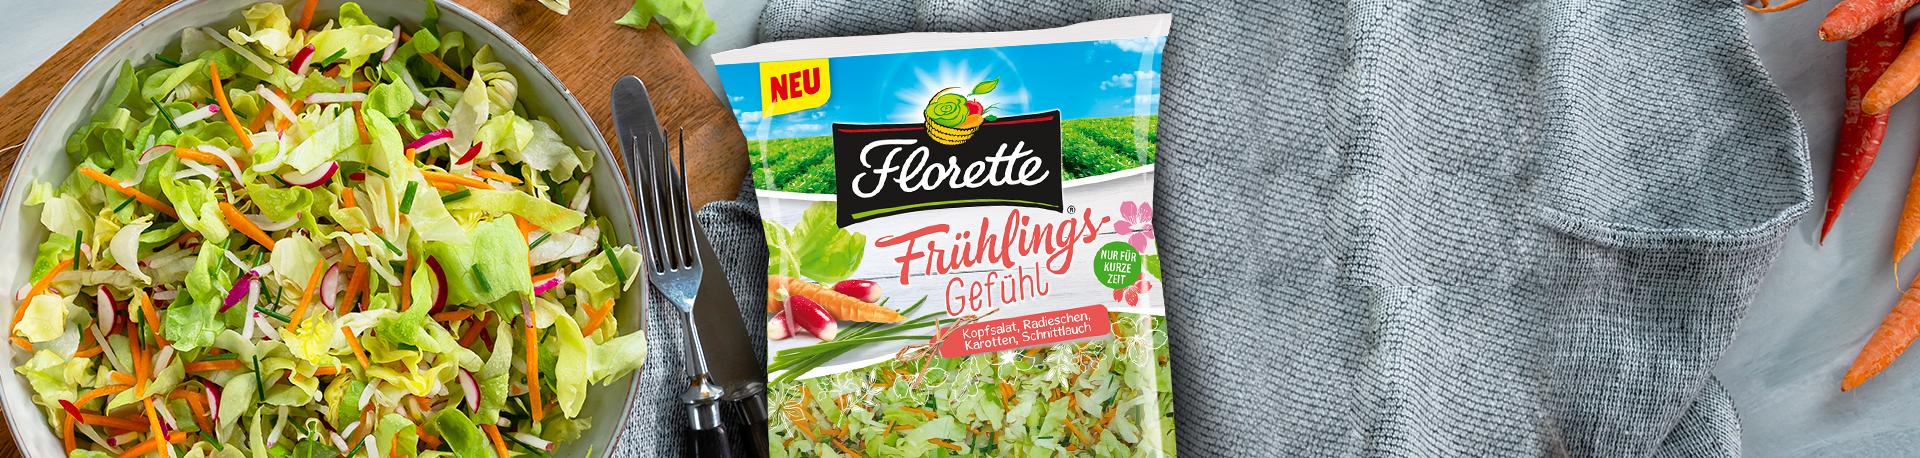 Header Florette Frühlingsgefühl